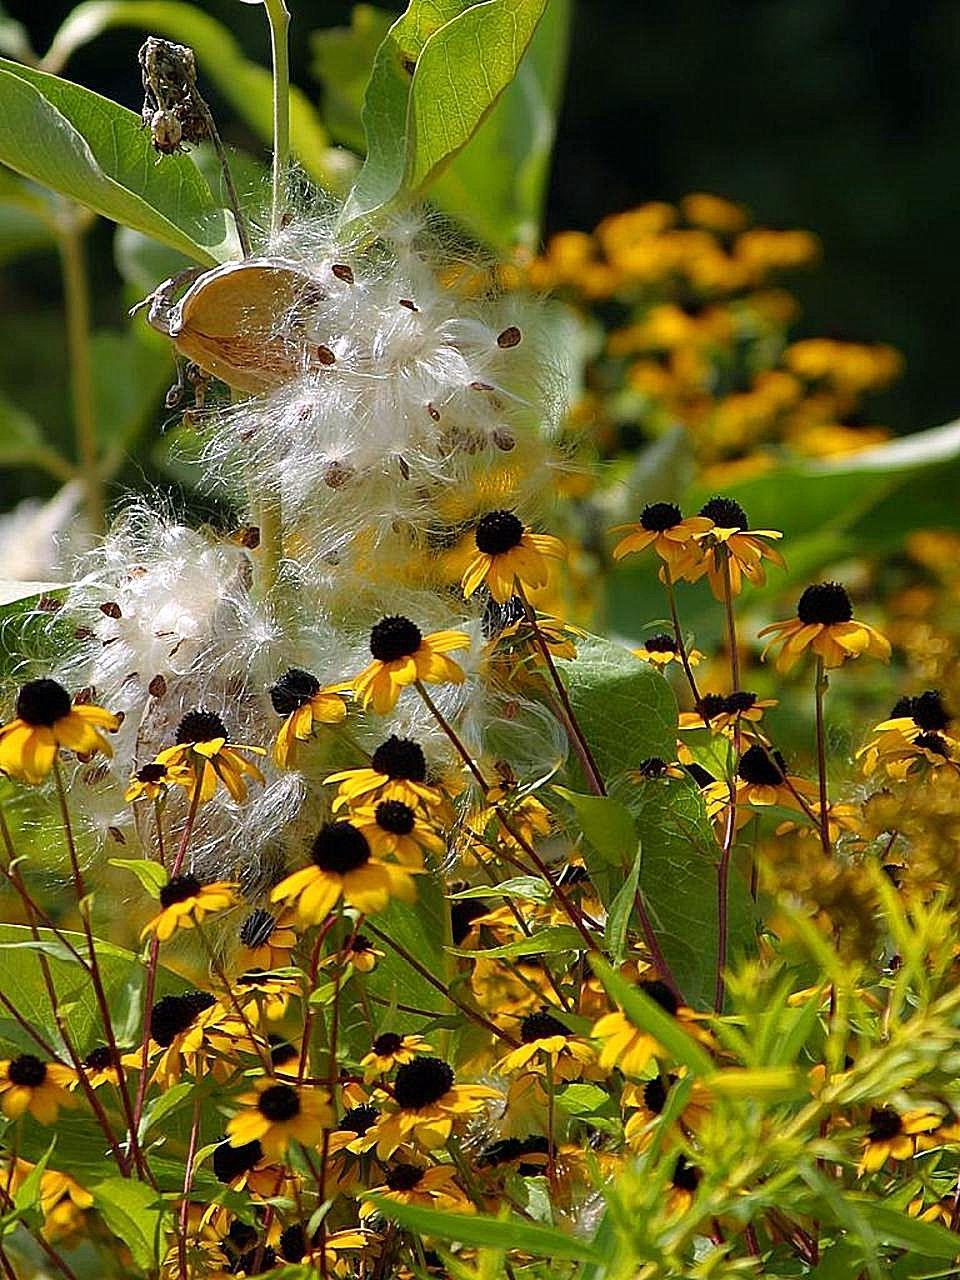 Filesmall Yellow Black Flowers On Grassg Wikimedia Commons